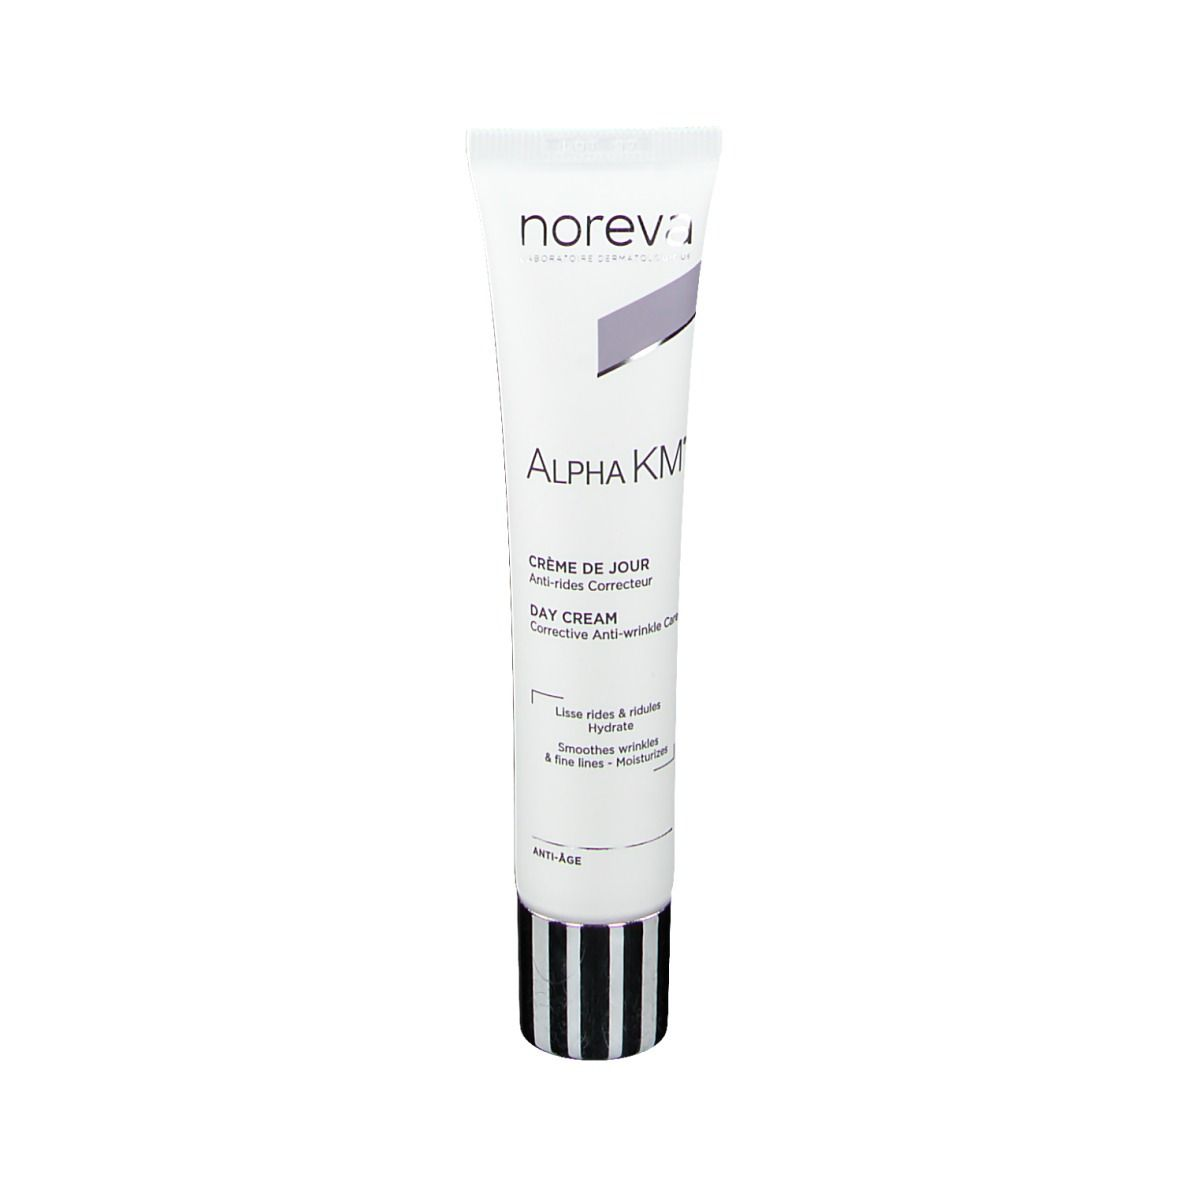 noreva Alpha KM® Creme